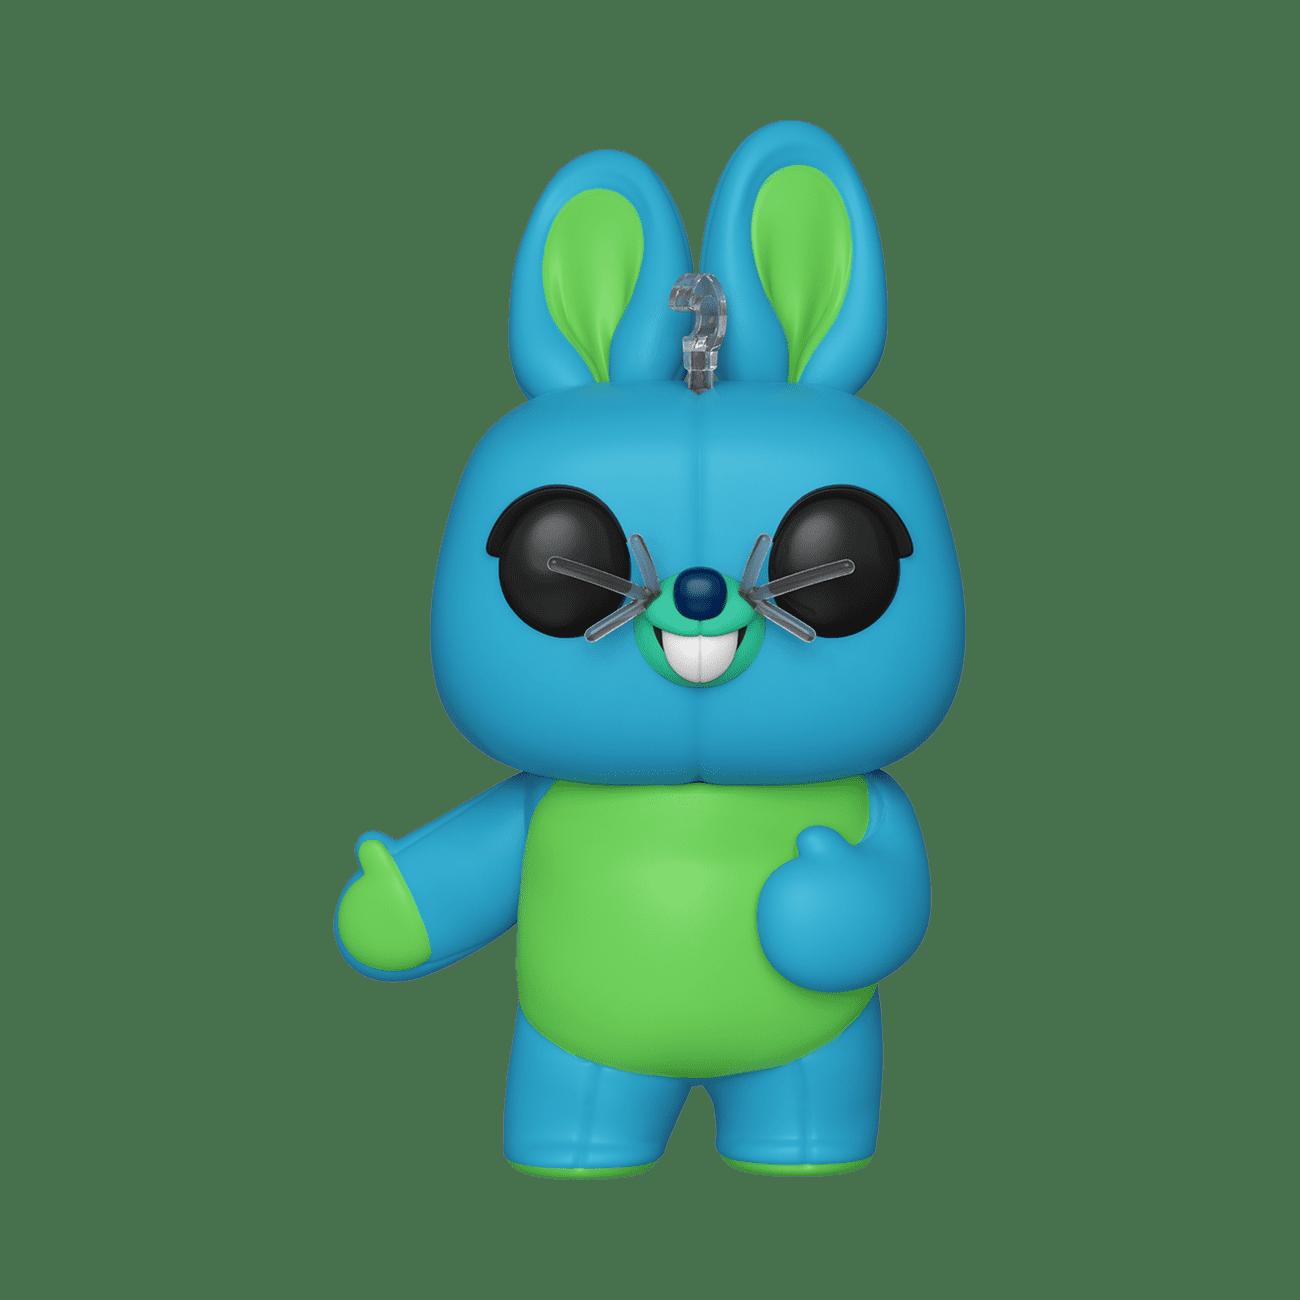 Funko Pop Disney Toy Story 4 Bunny Walmart Com Walmart Com